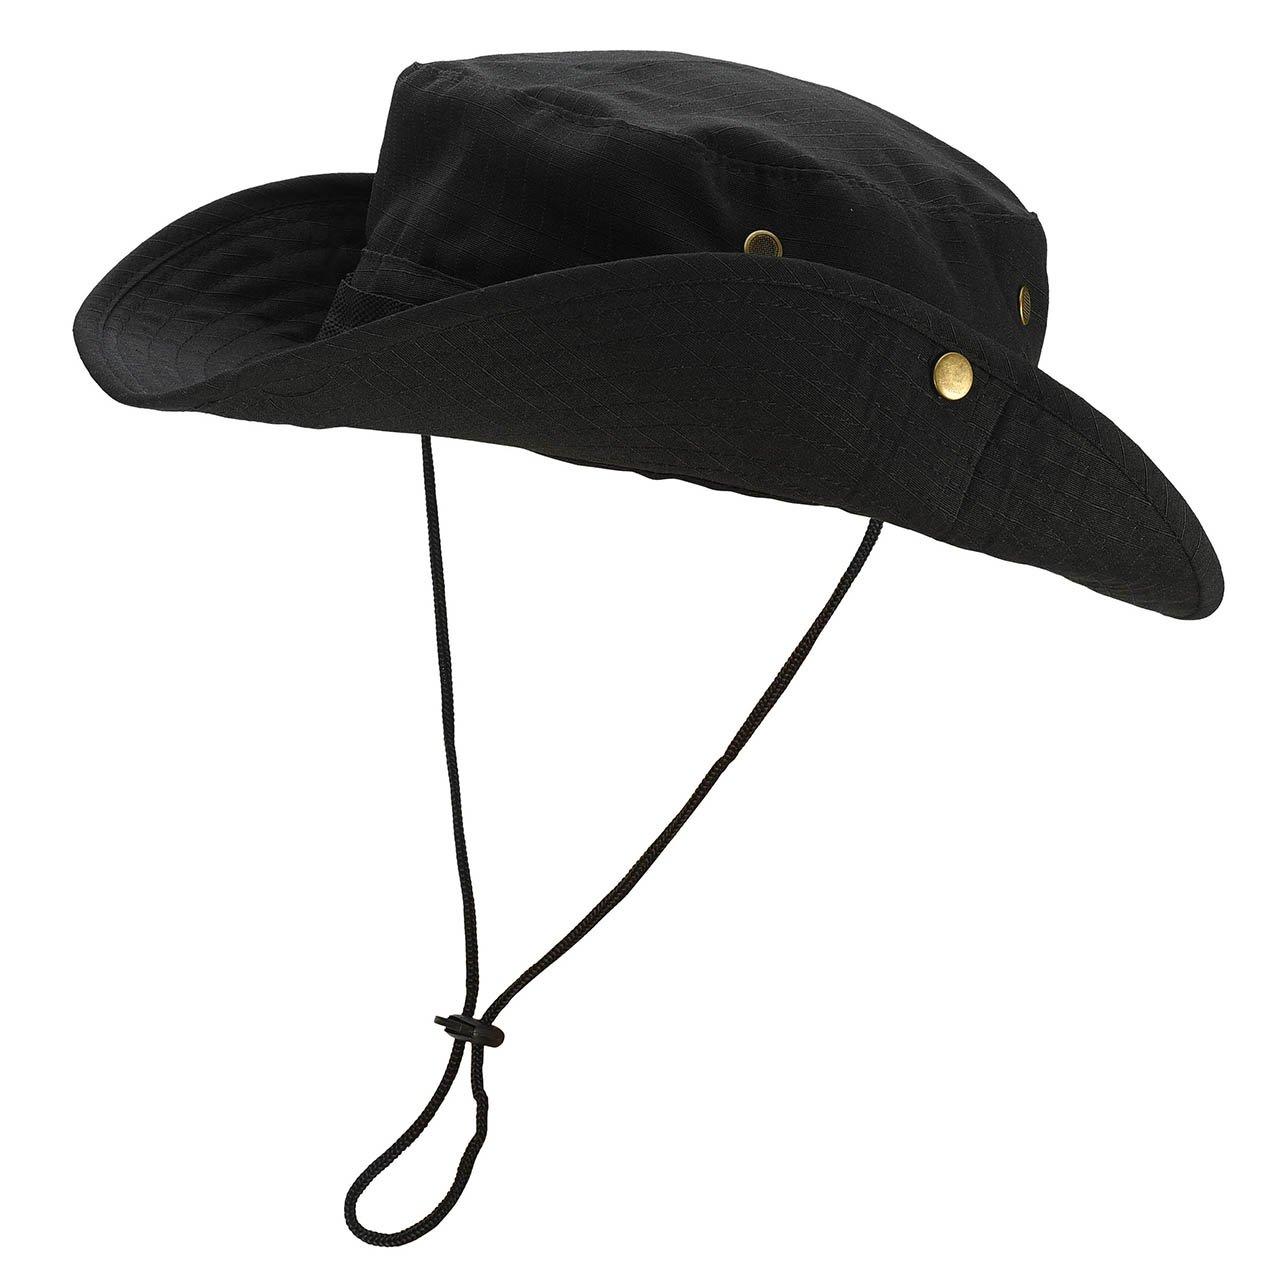 Faleto Bucket Hat Boonie Cowboy Hat Wide Brim Caps Fishing Hat with Adjustable Strap